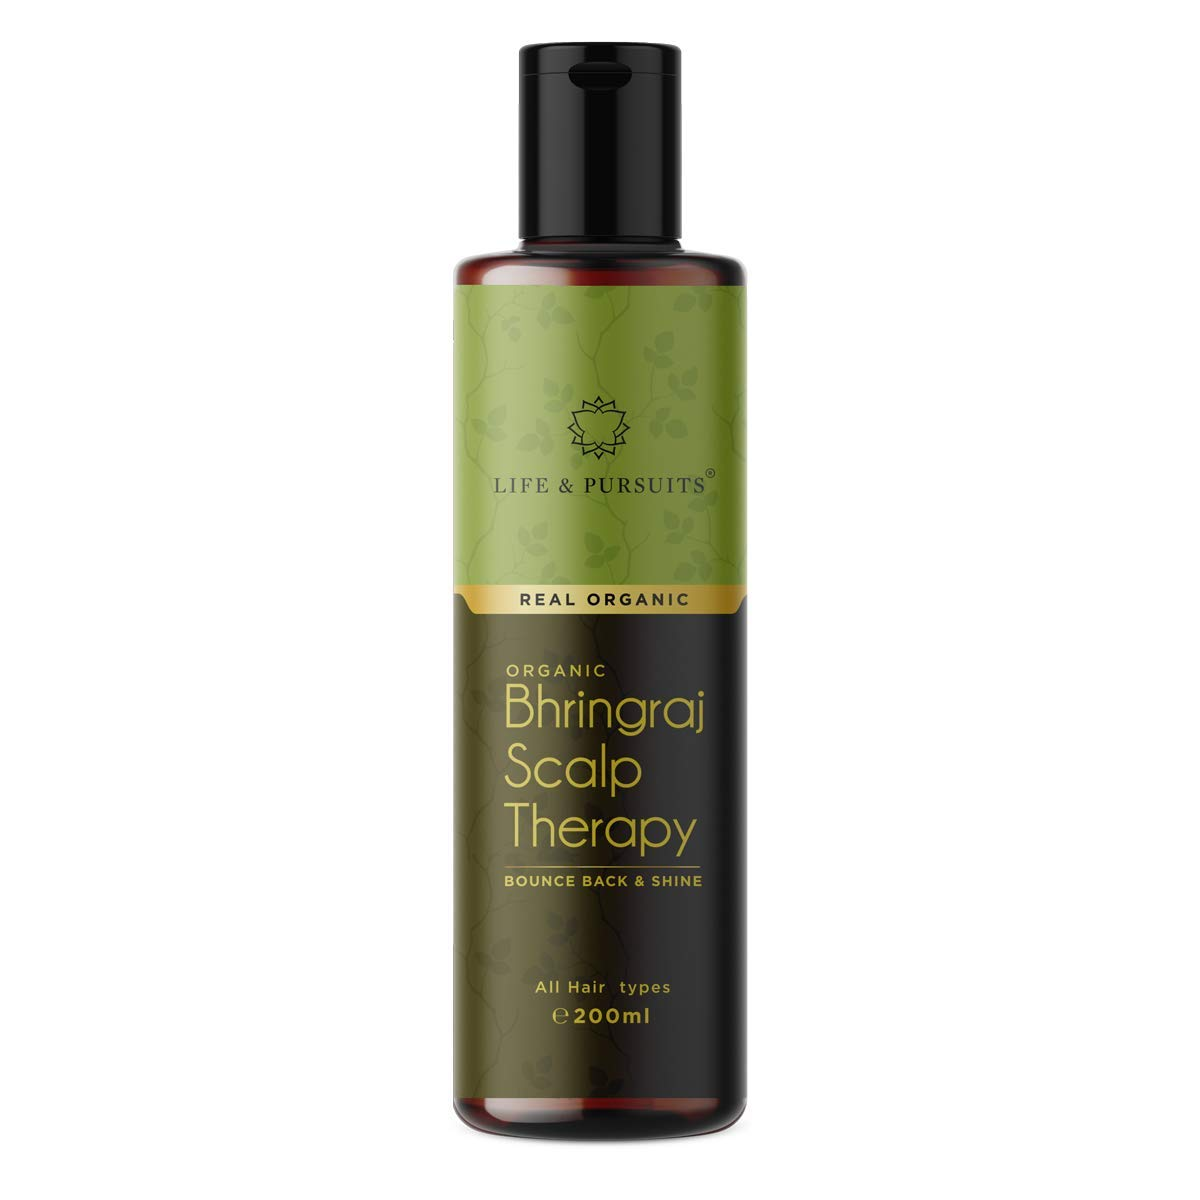 Life & Pursuits USDA Organic Hair Oil For Hair Growth With Bhringraj, Amla, Coconut Oil & Castor Oil | Indian Ayurvedic Dry Scalp Therapy (200 ml/6.76 fl oz)